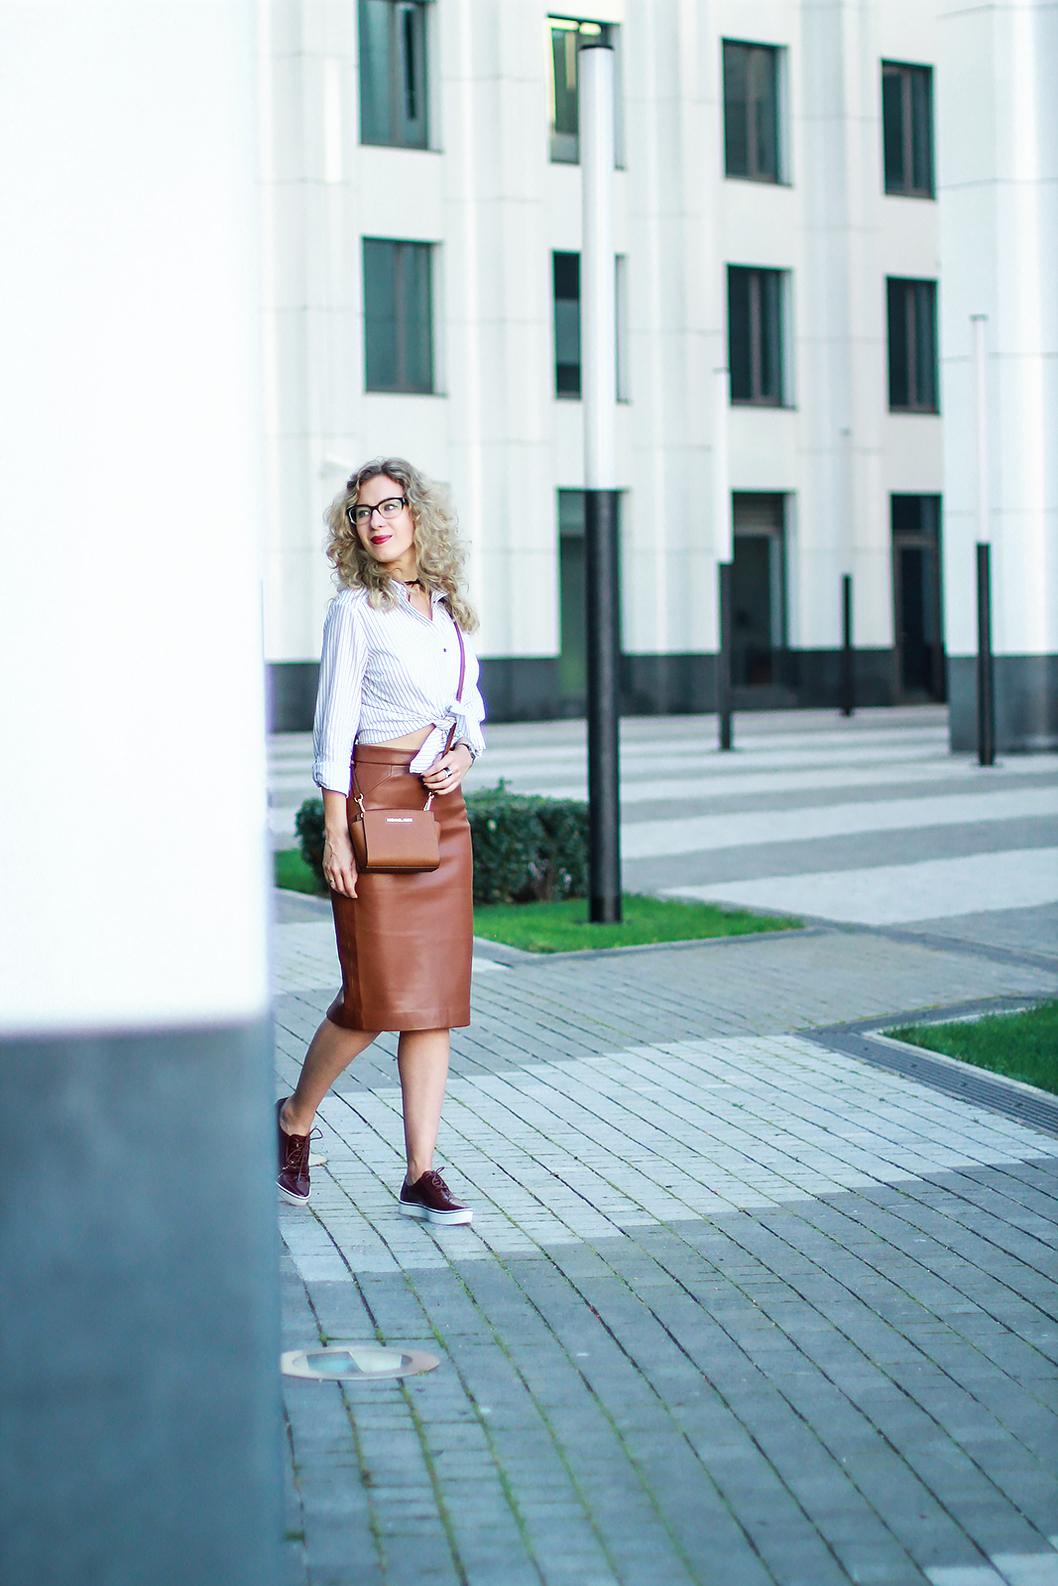 margarita_maslova_leather_skirt_stryped_shirt_marsala_brogues_streetlook